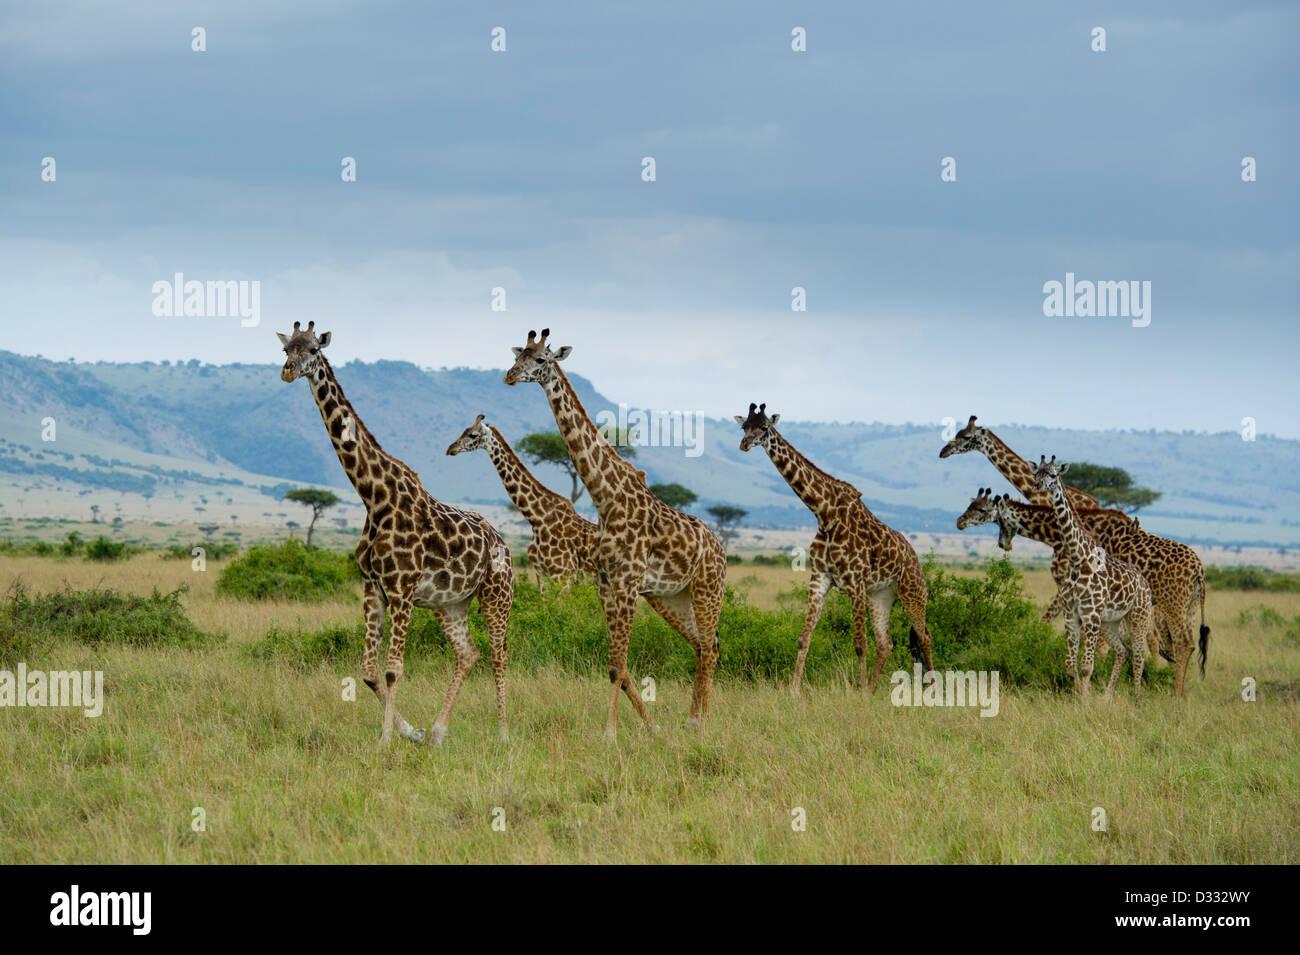 Maasai giraffe (Giraffa camelopardalis tippelskirchi) in front of the Oloololo escarpment, Maasai Mara National Stock Photo